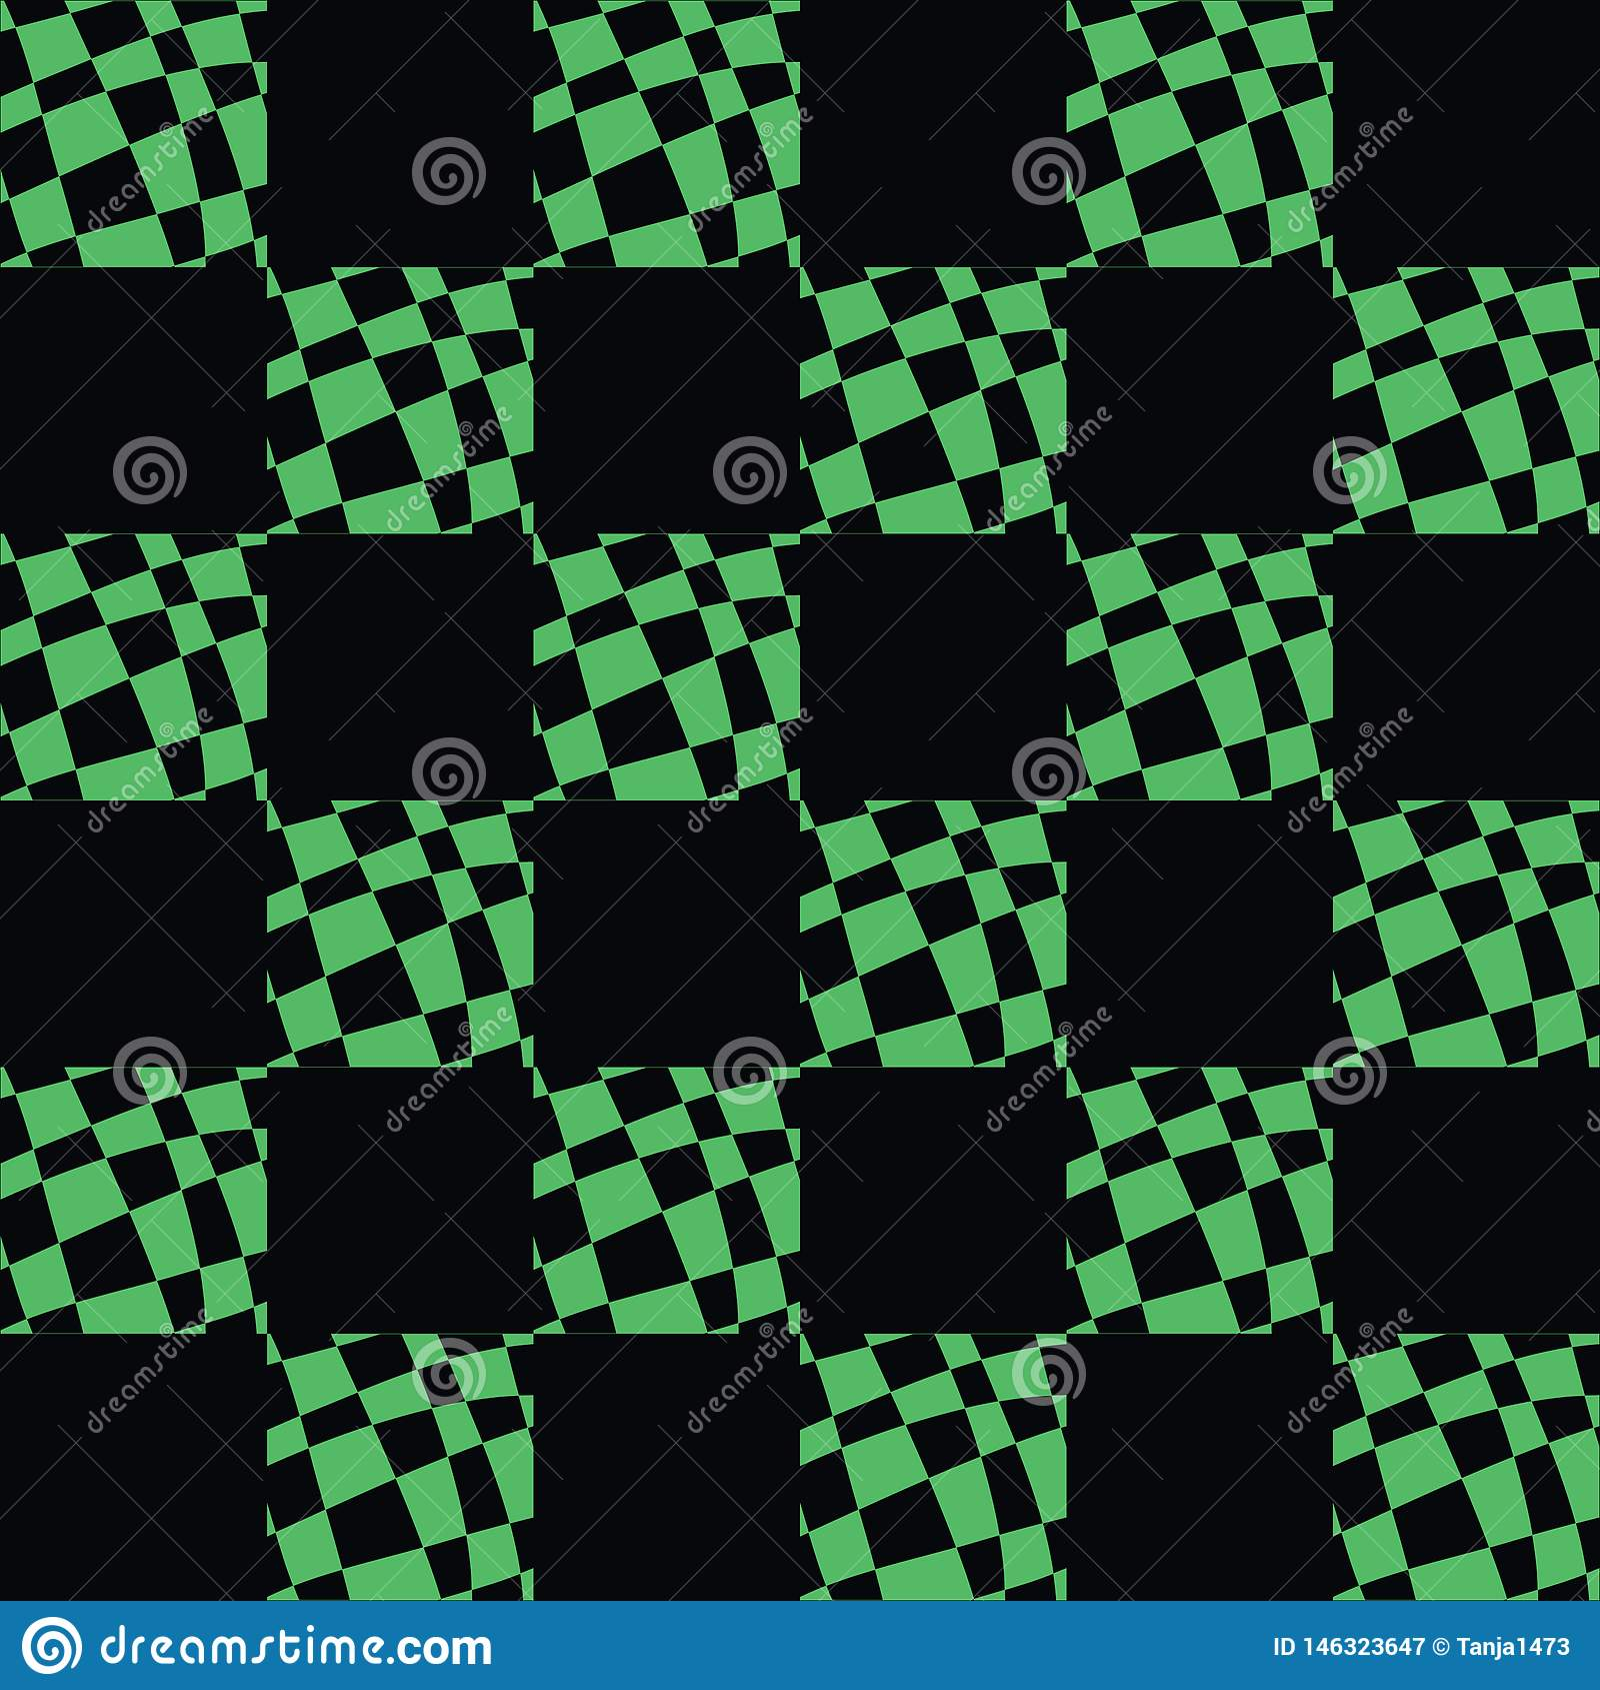 Art Deco Pattern Of Geometric Elements. Seamless Pattern. Vector Illustration. Design For Printing, Presentation